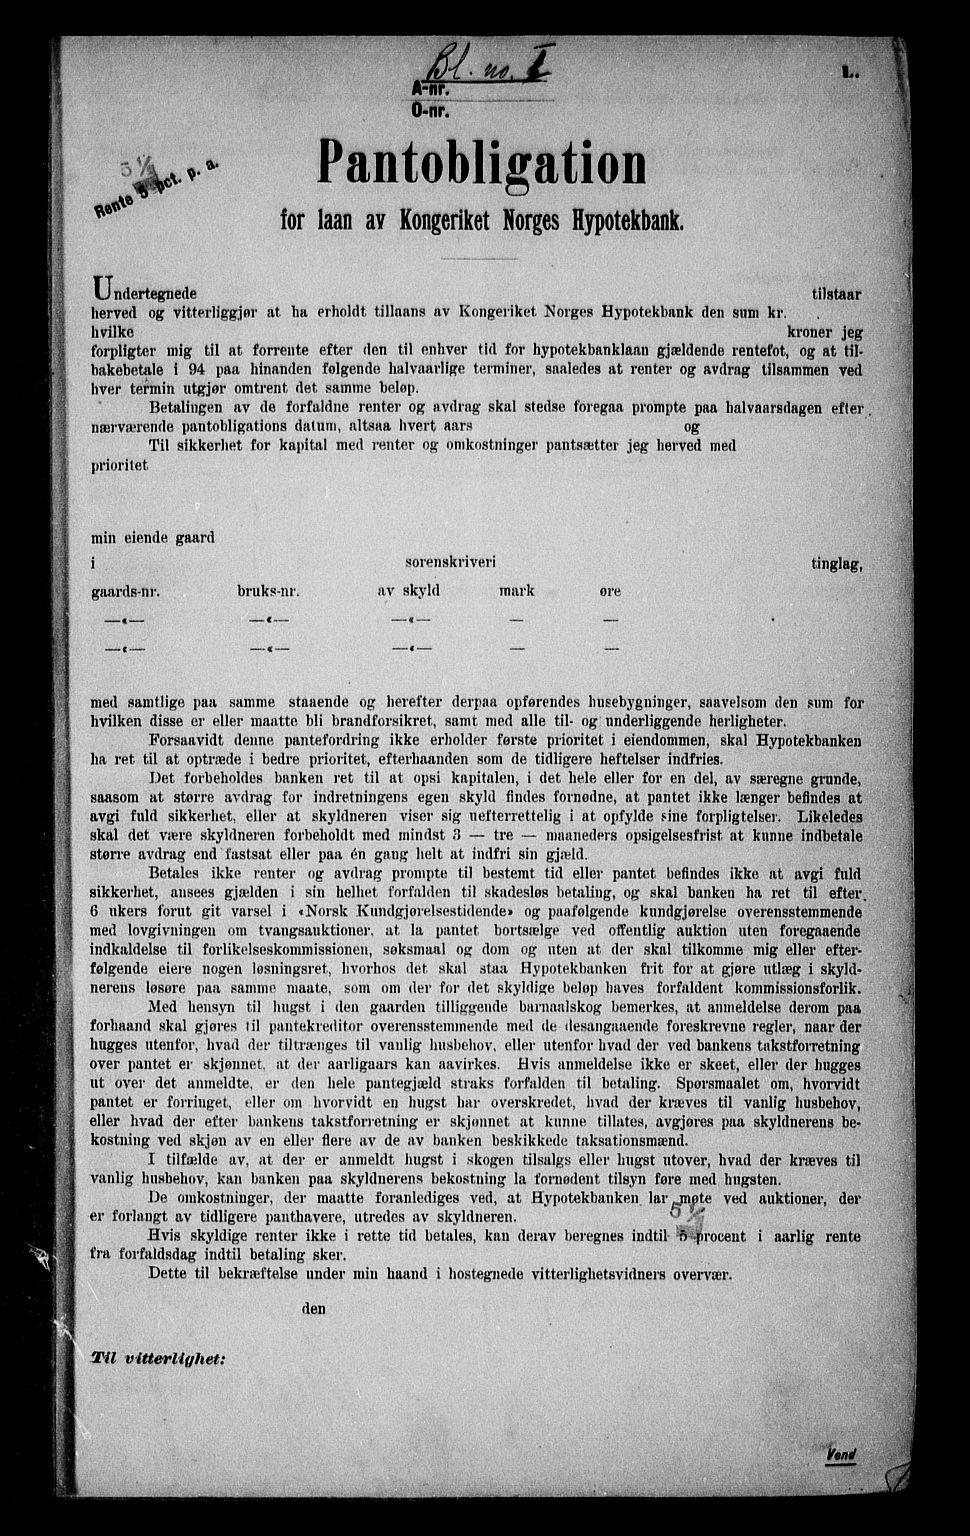 SAO, Onsøy sorenskriveri, G/Ga/Gaa/L0051: Pantebok nr. I 51, 1923-1924, s. 1